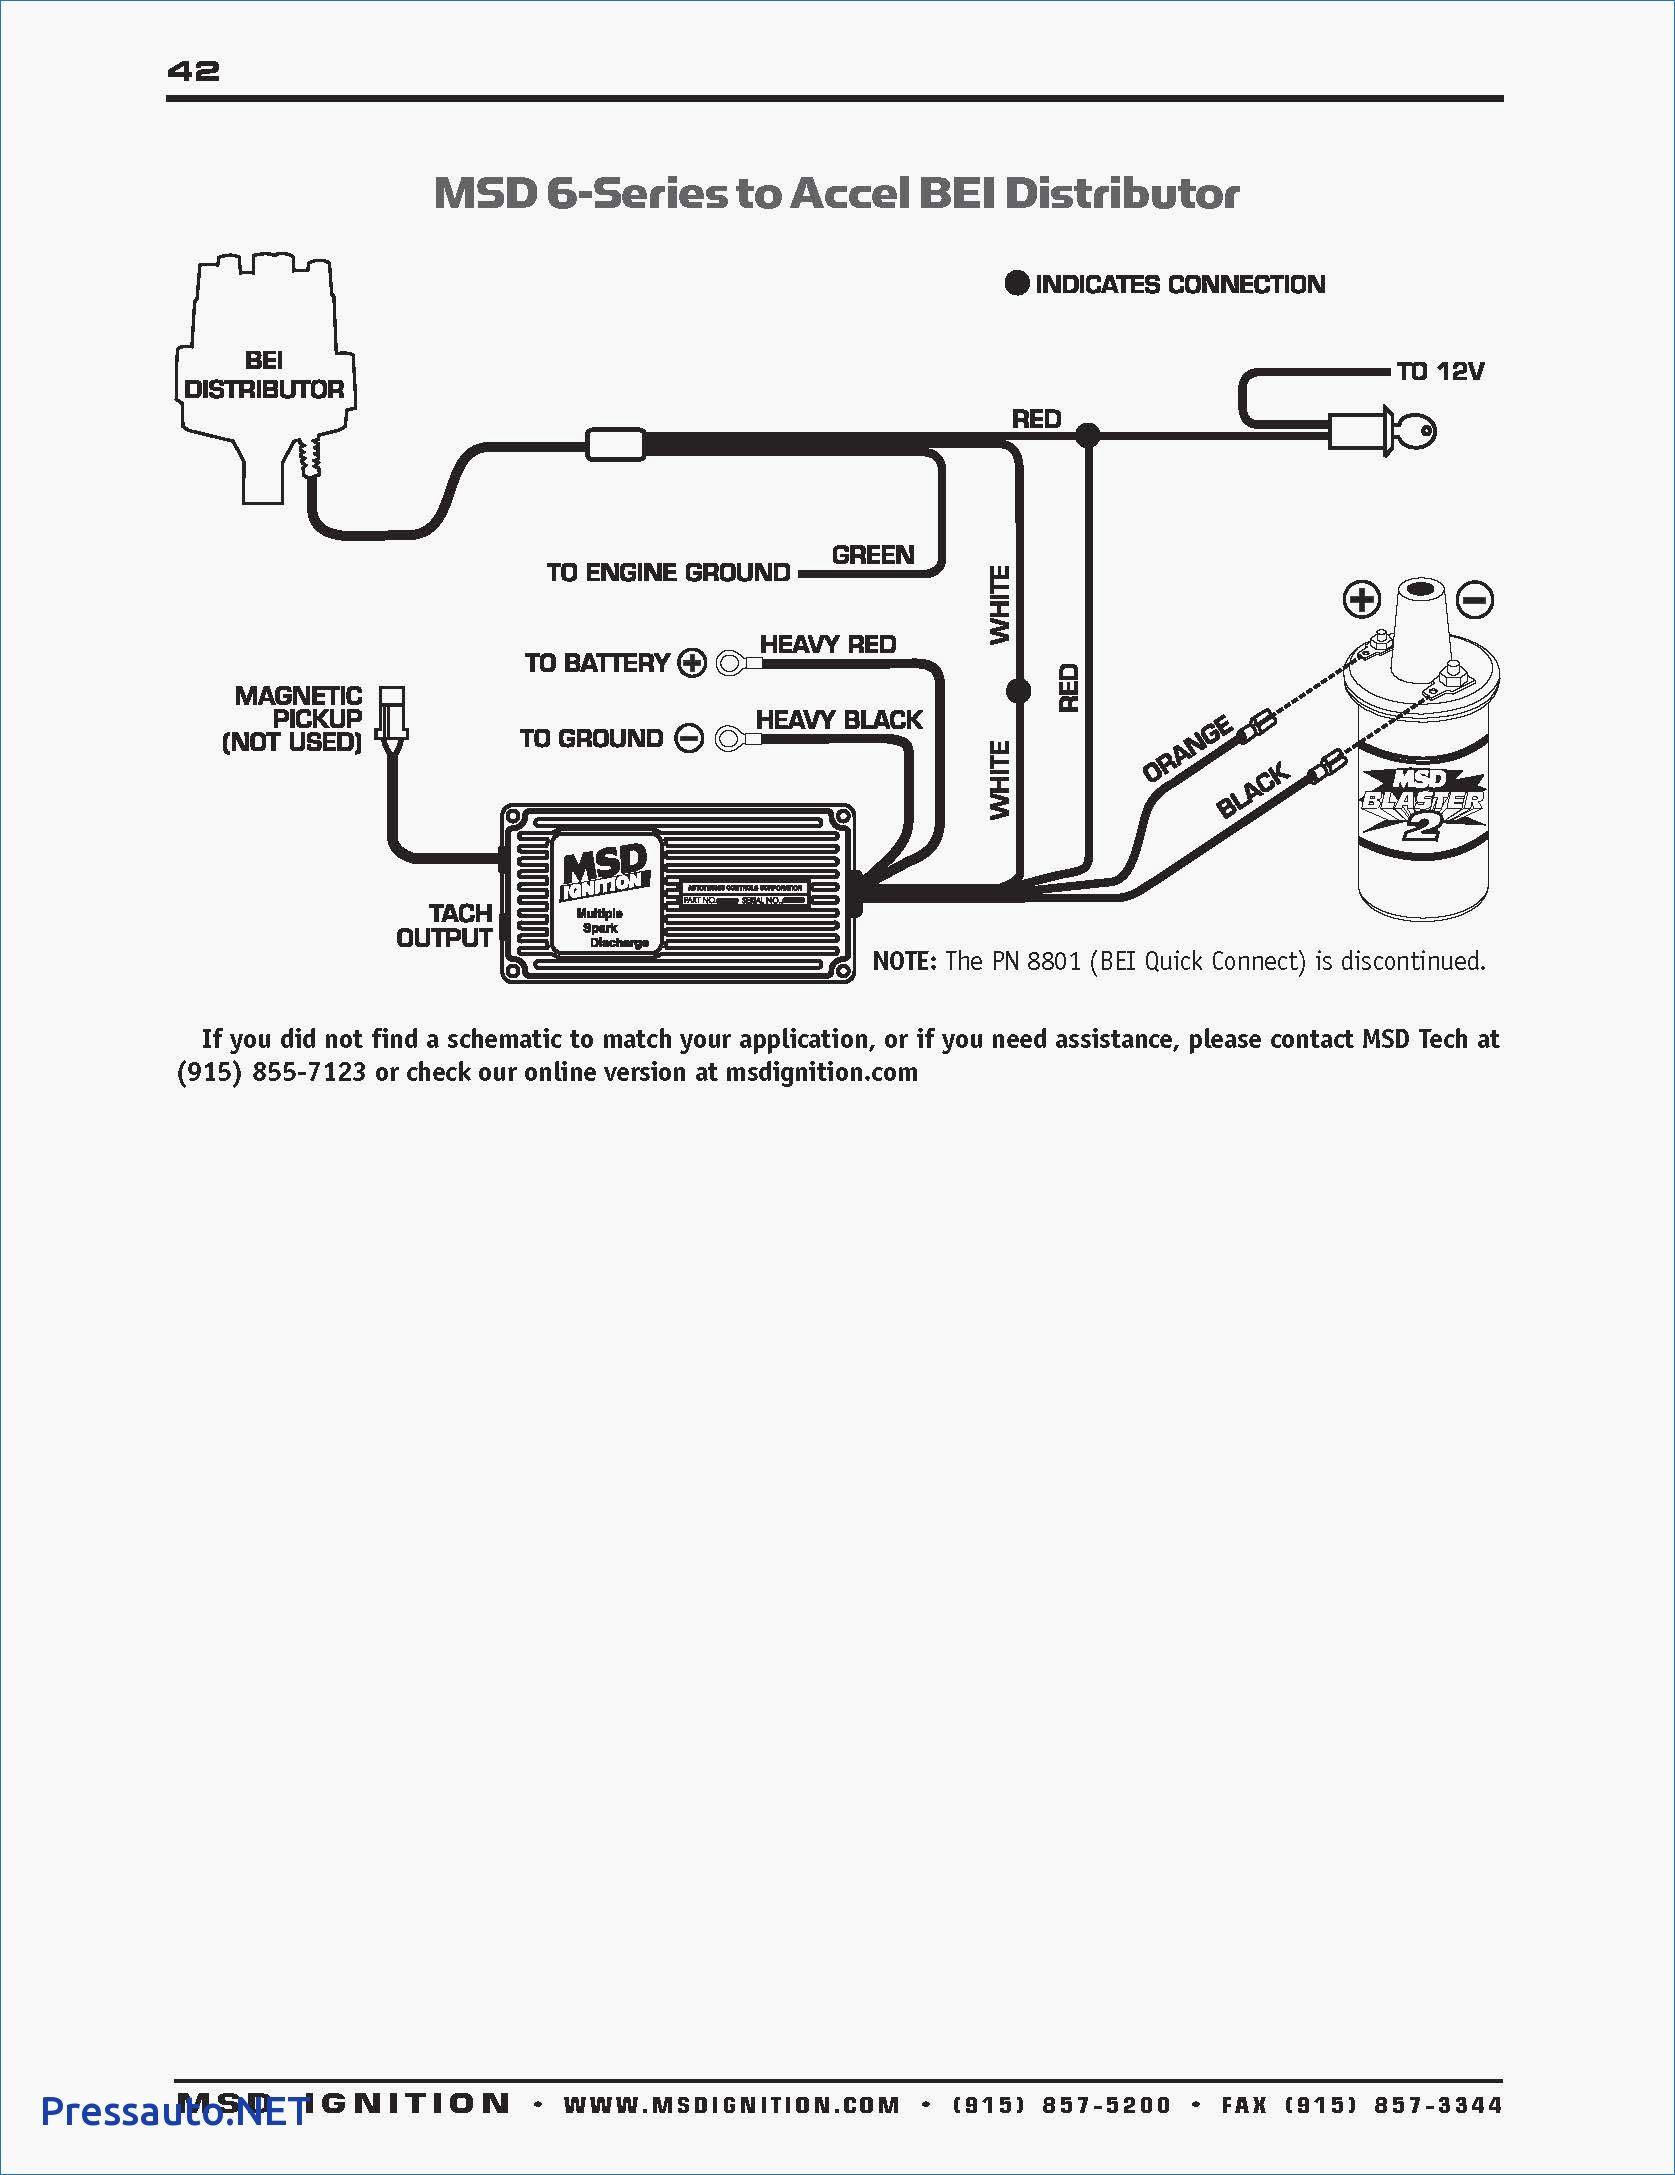 Glc 86 Volvo Fuse Box Diagram - Wiring Diagram Signals & ITS ... Yt Wiring Diagram on